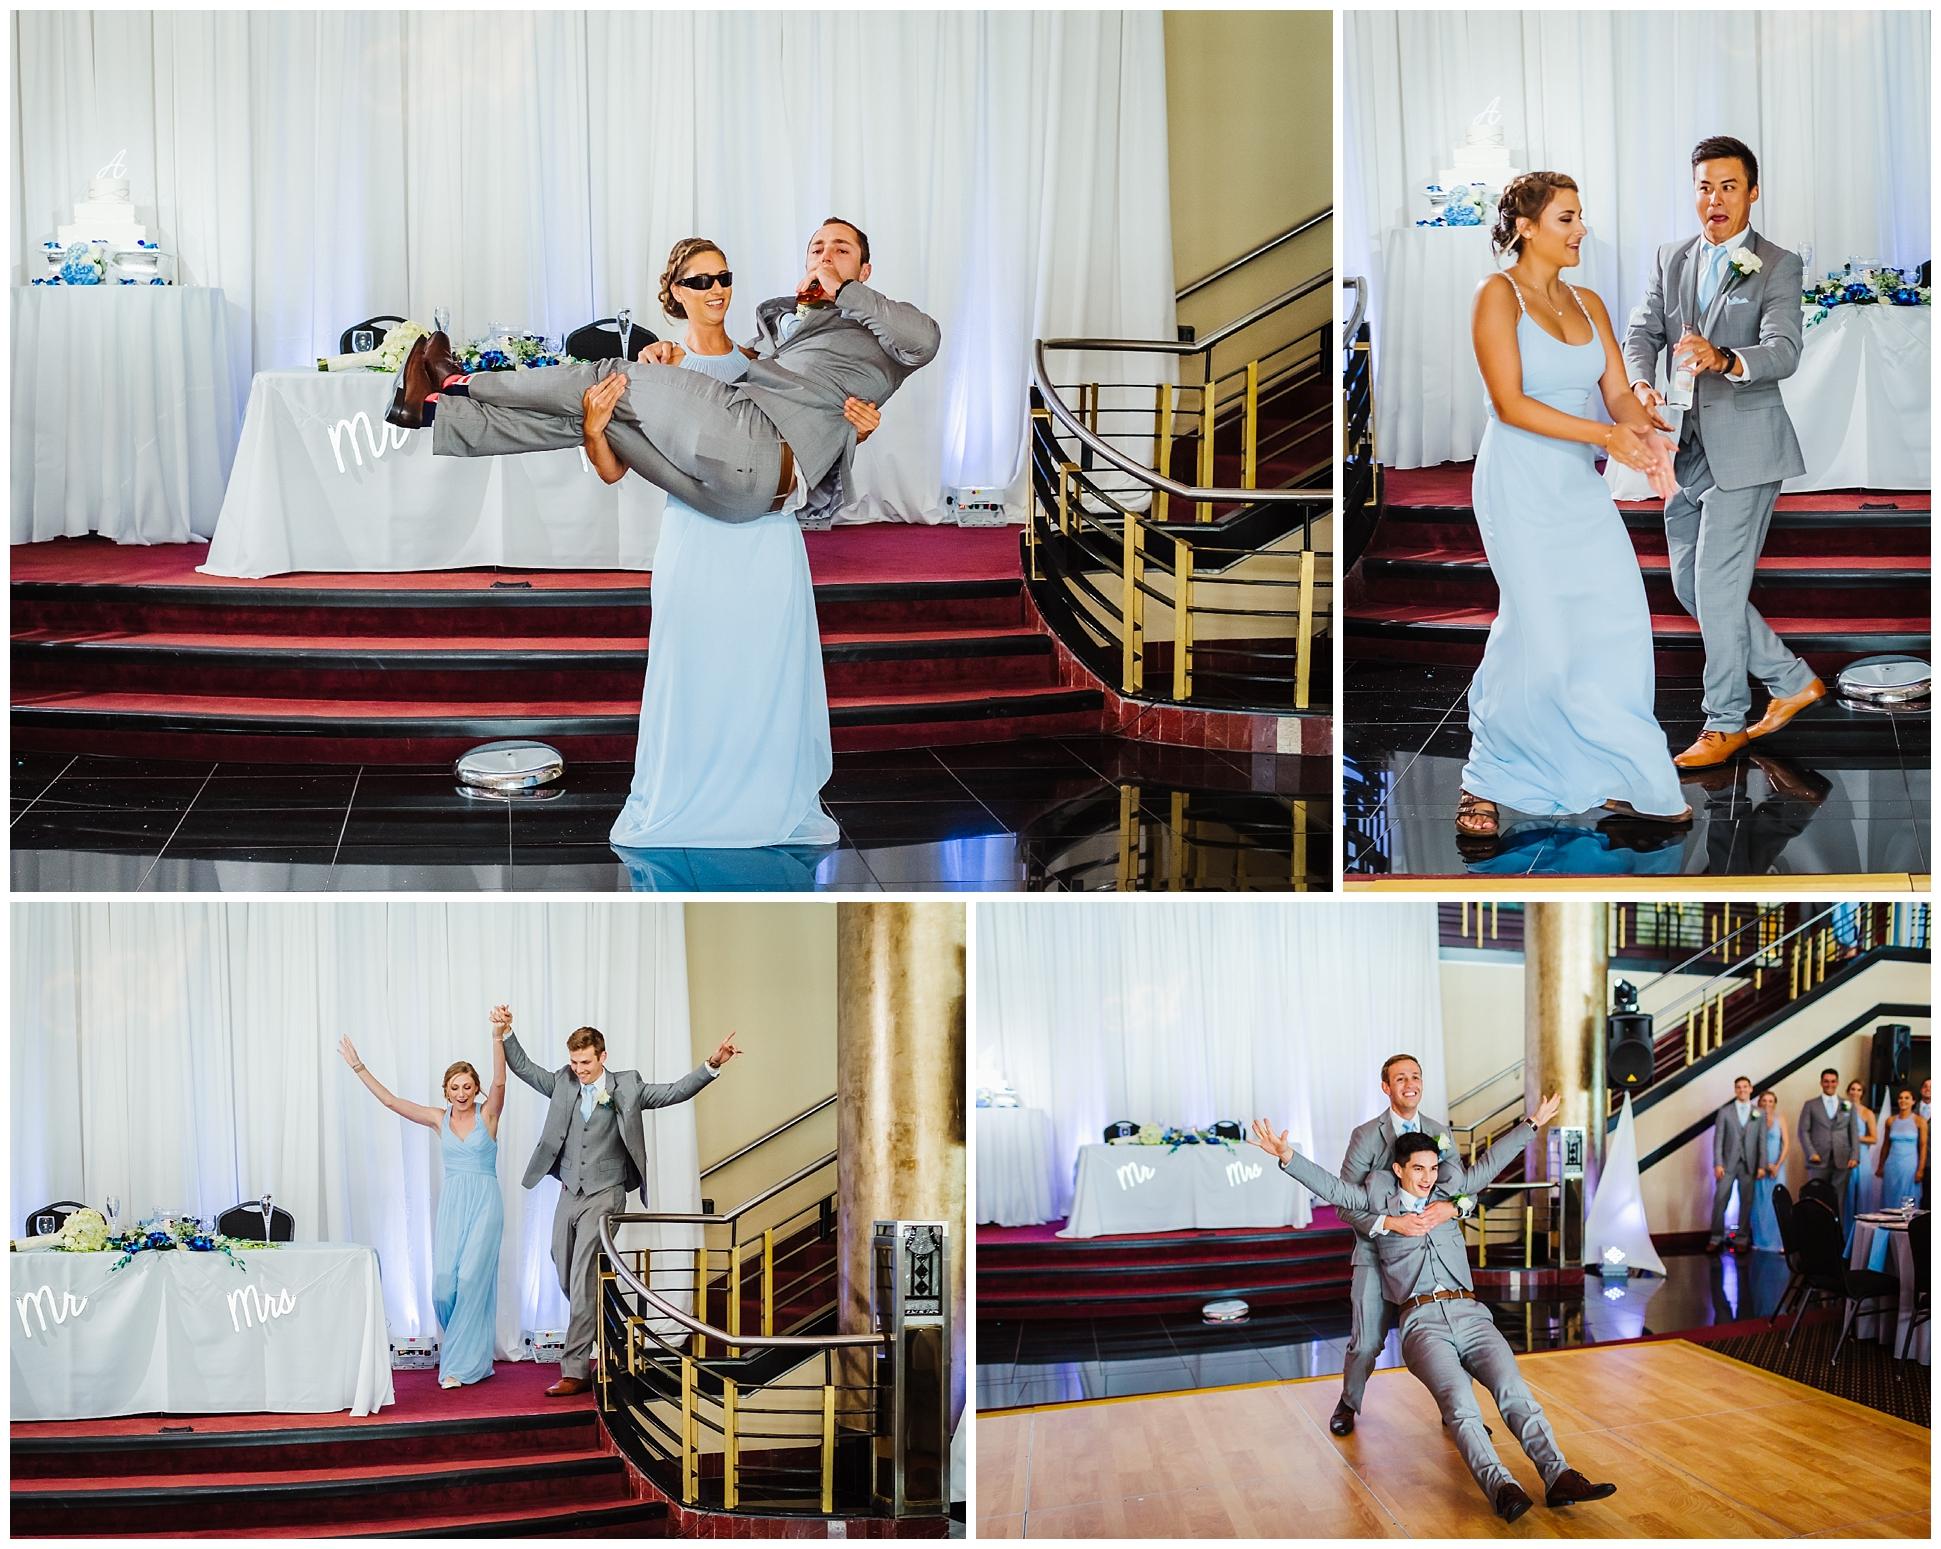 mahaffey-theater-big-military-wedding-st-pete-photographer-blue_0075.jpg